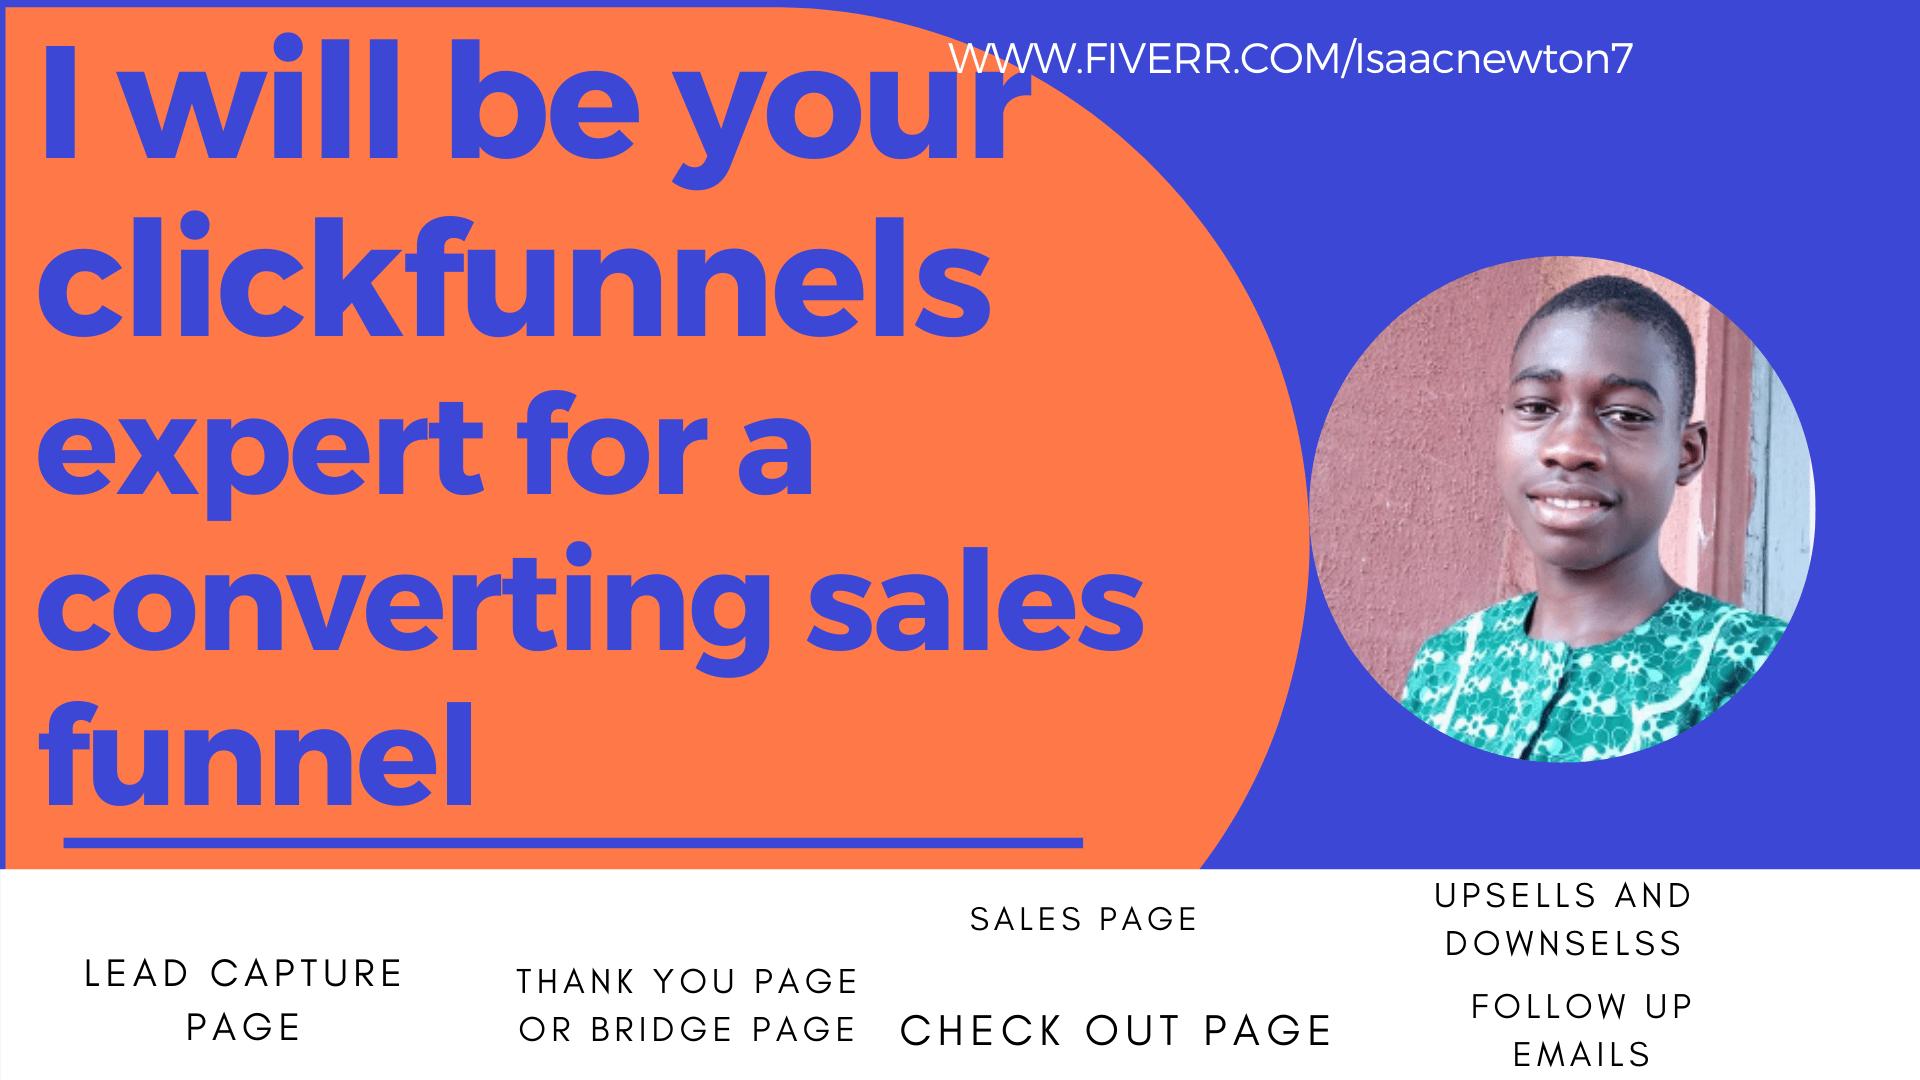 Clickfunnels expert clickfunnels sales funnel or landing page design, FiverrBox